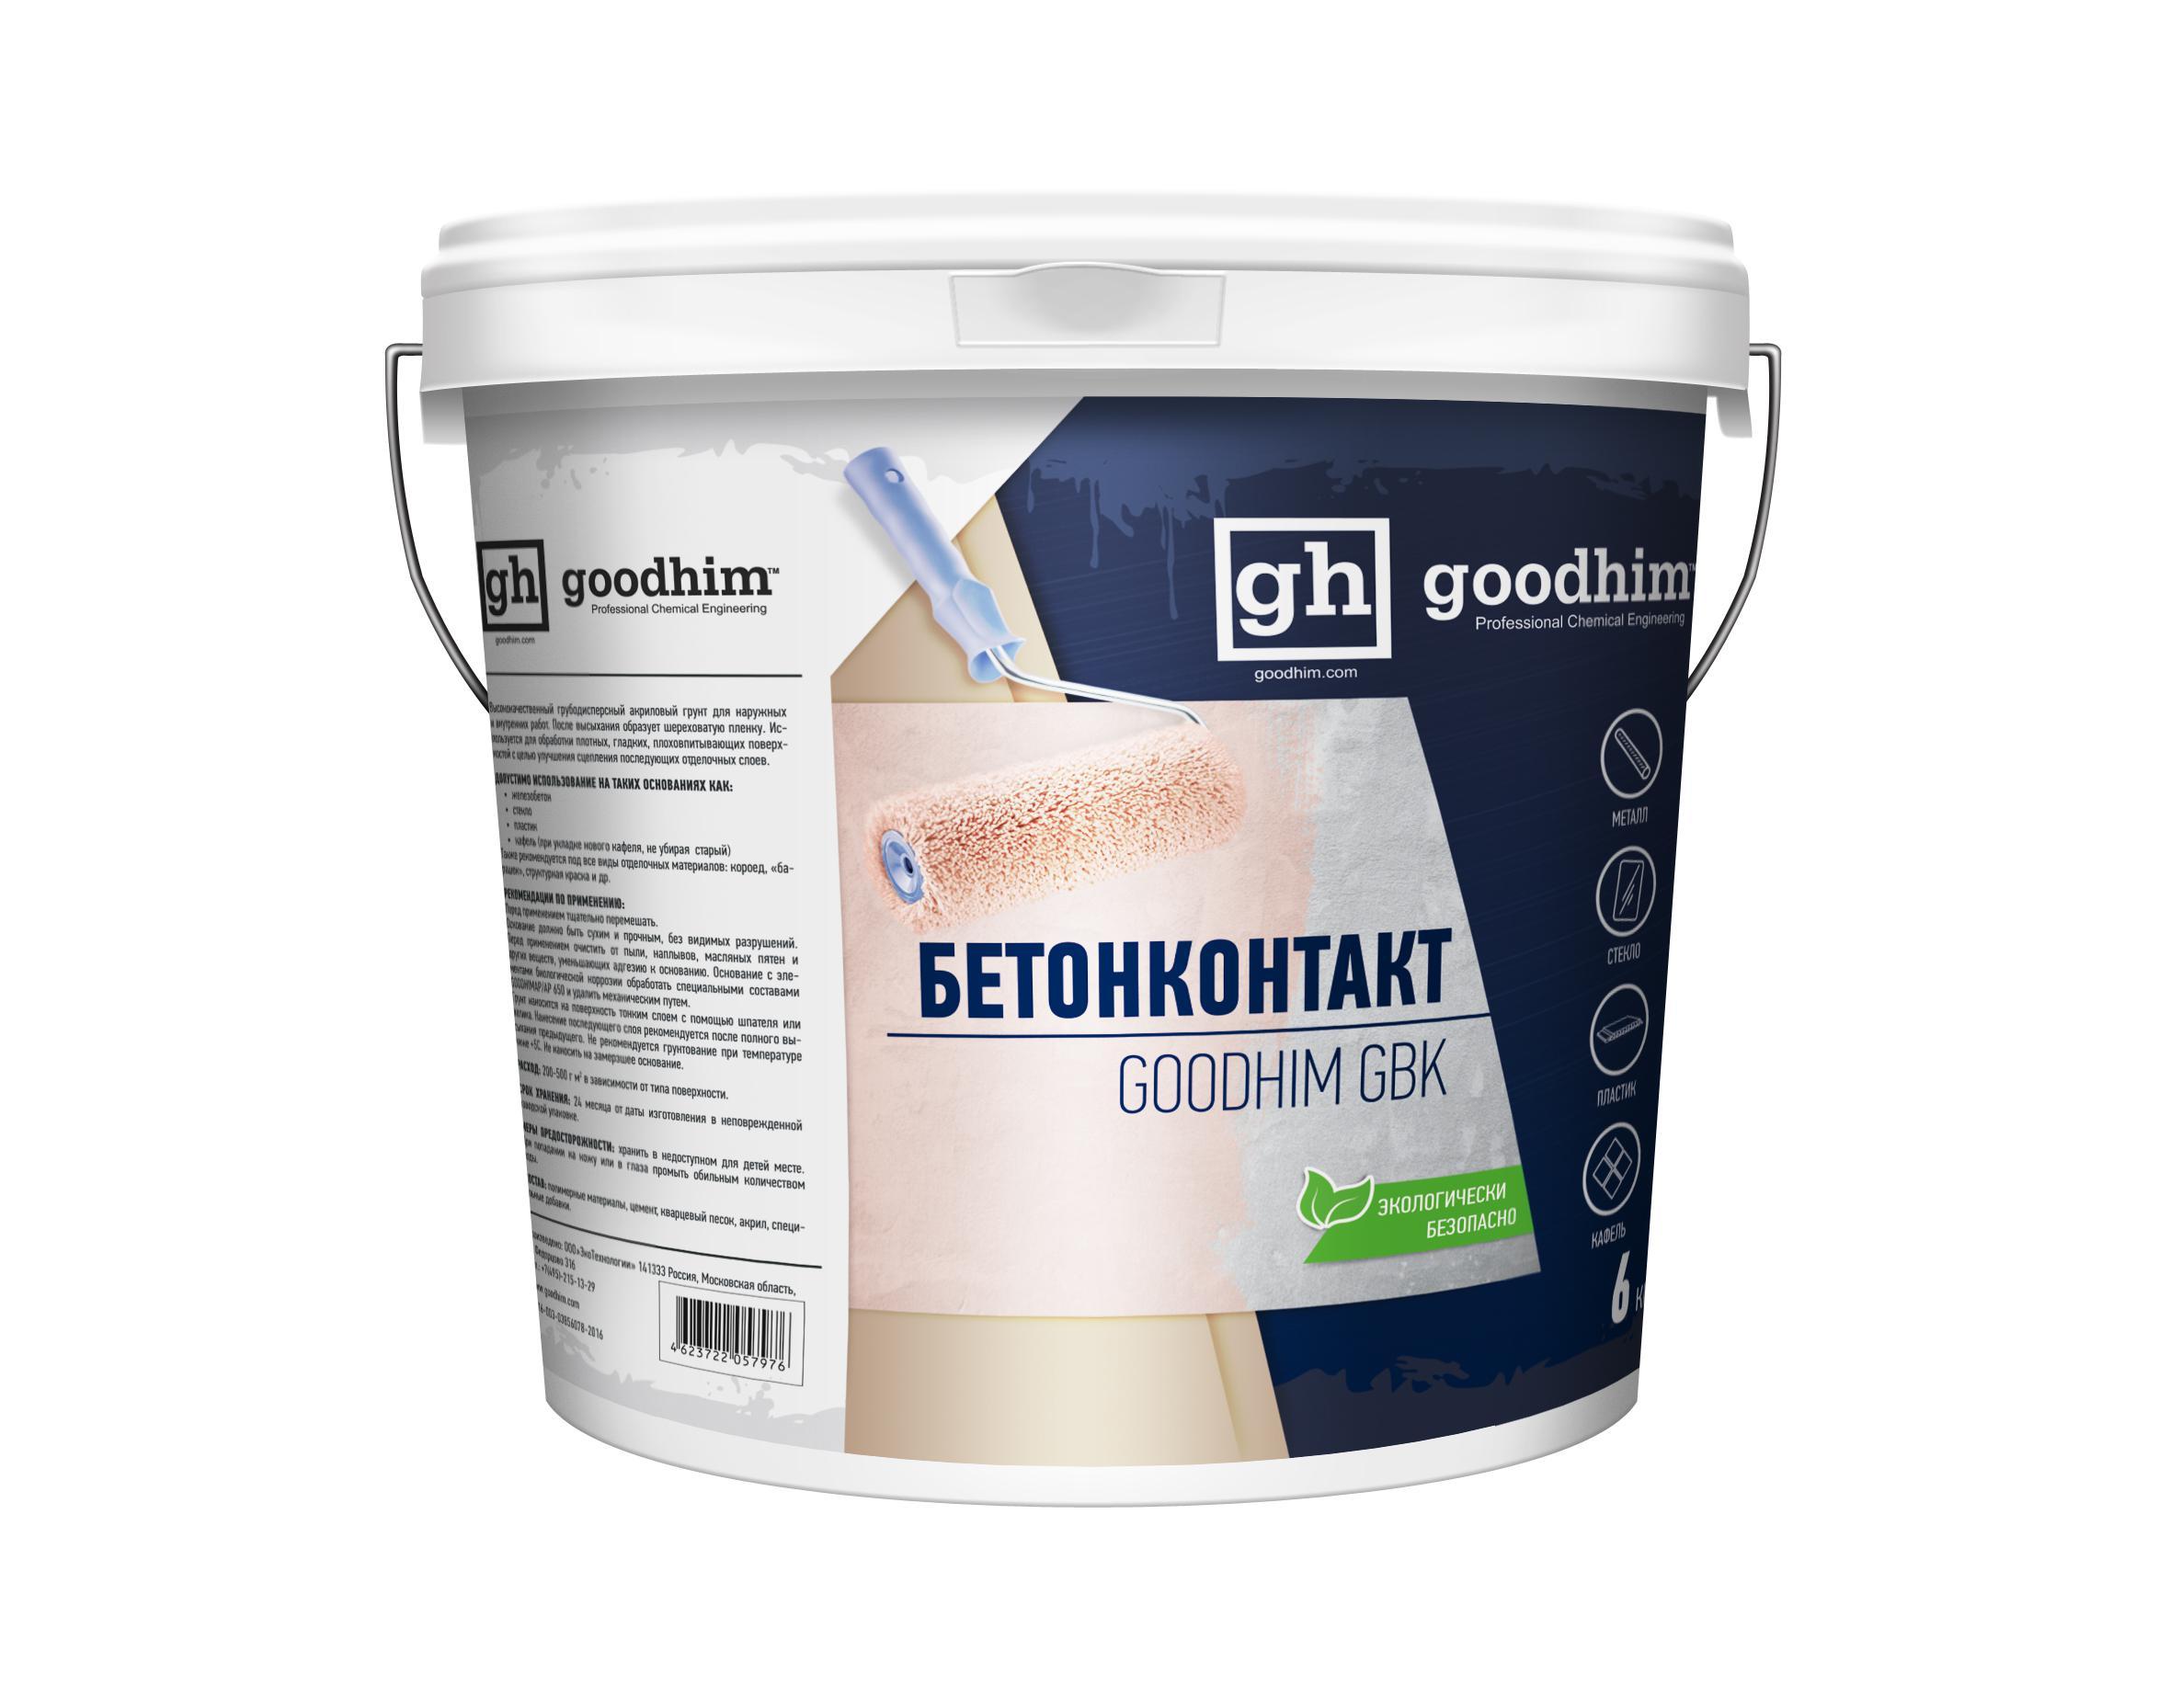 Бетоноконтакт Goodhim Gbk готовый продукт 6 кг